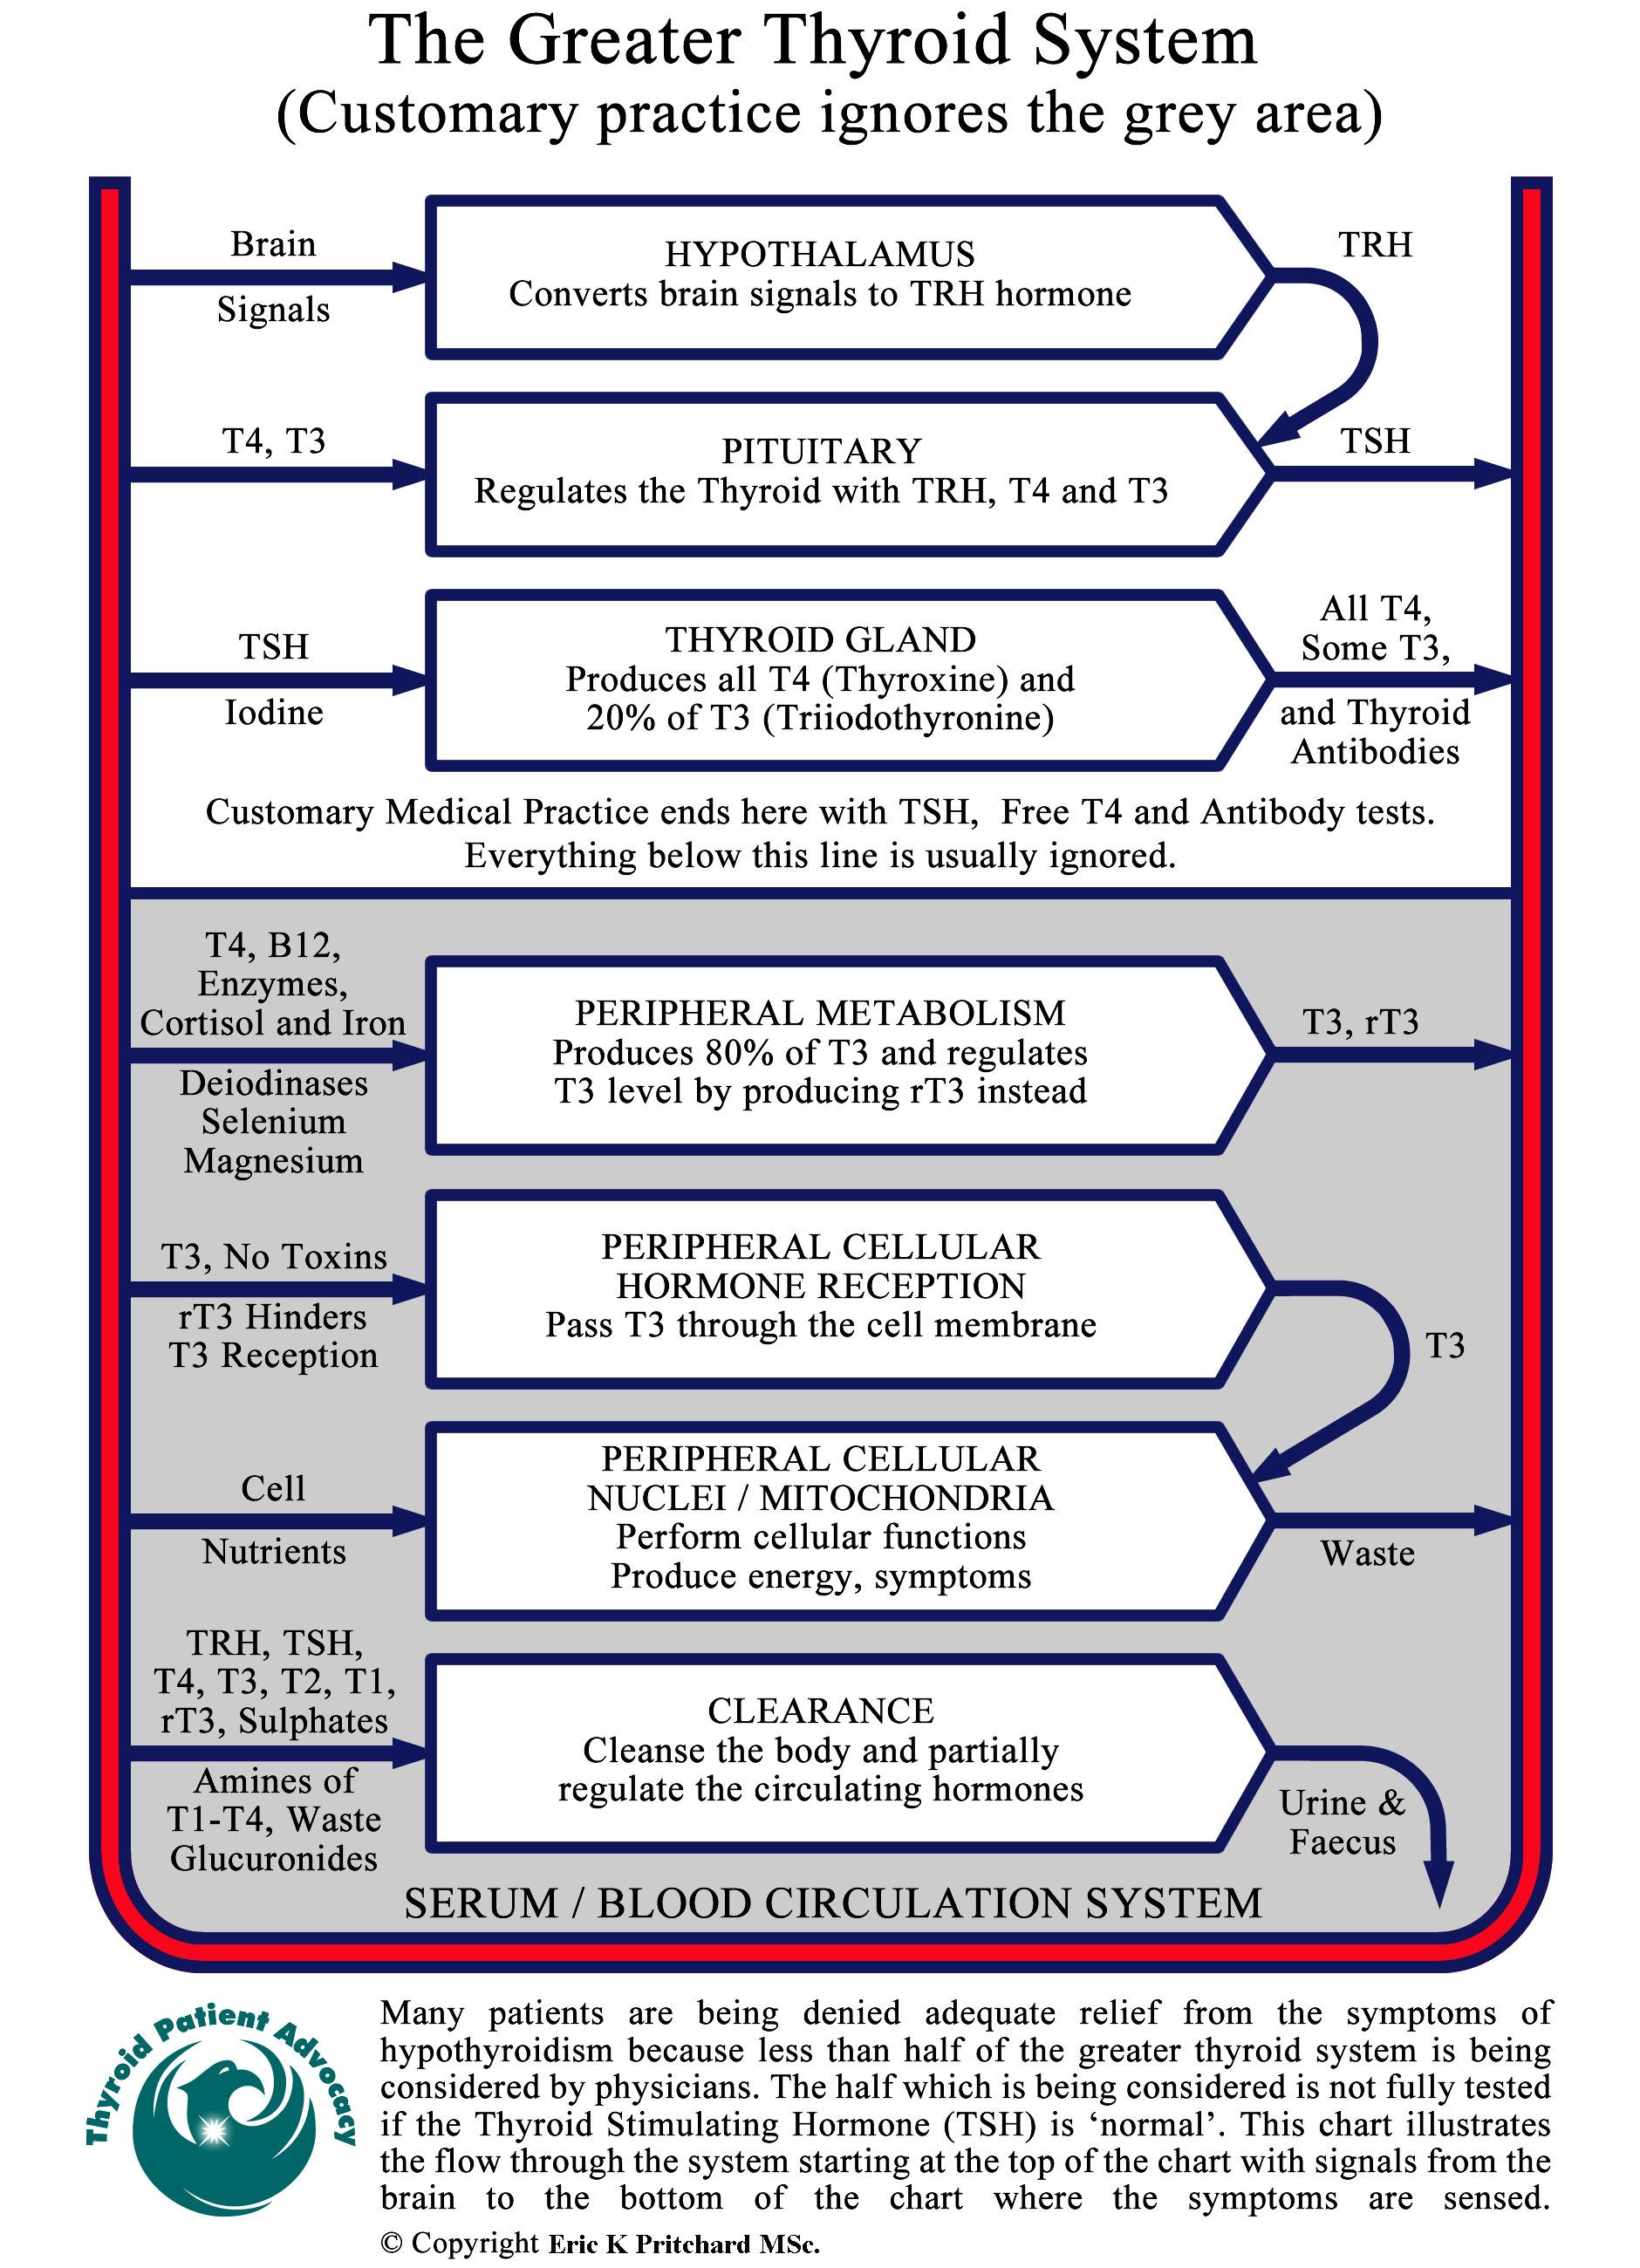 understanding thyroid disease essay Understanding thyroid disease essay by 12/11/2017 22 0 0 dissertation titles in rguhs use are essay titles underlined when written worksheet answers.